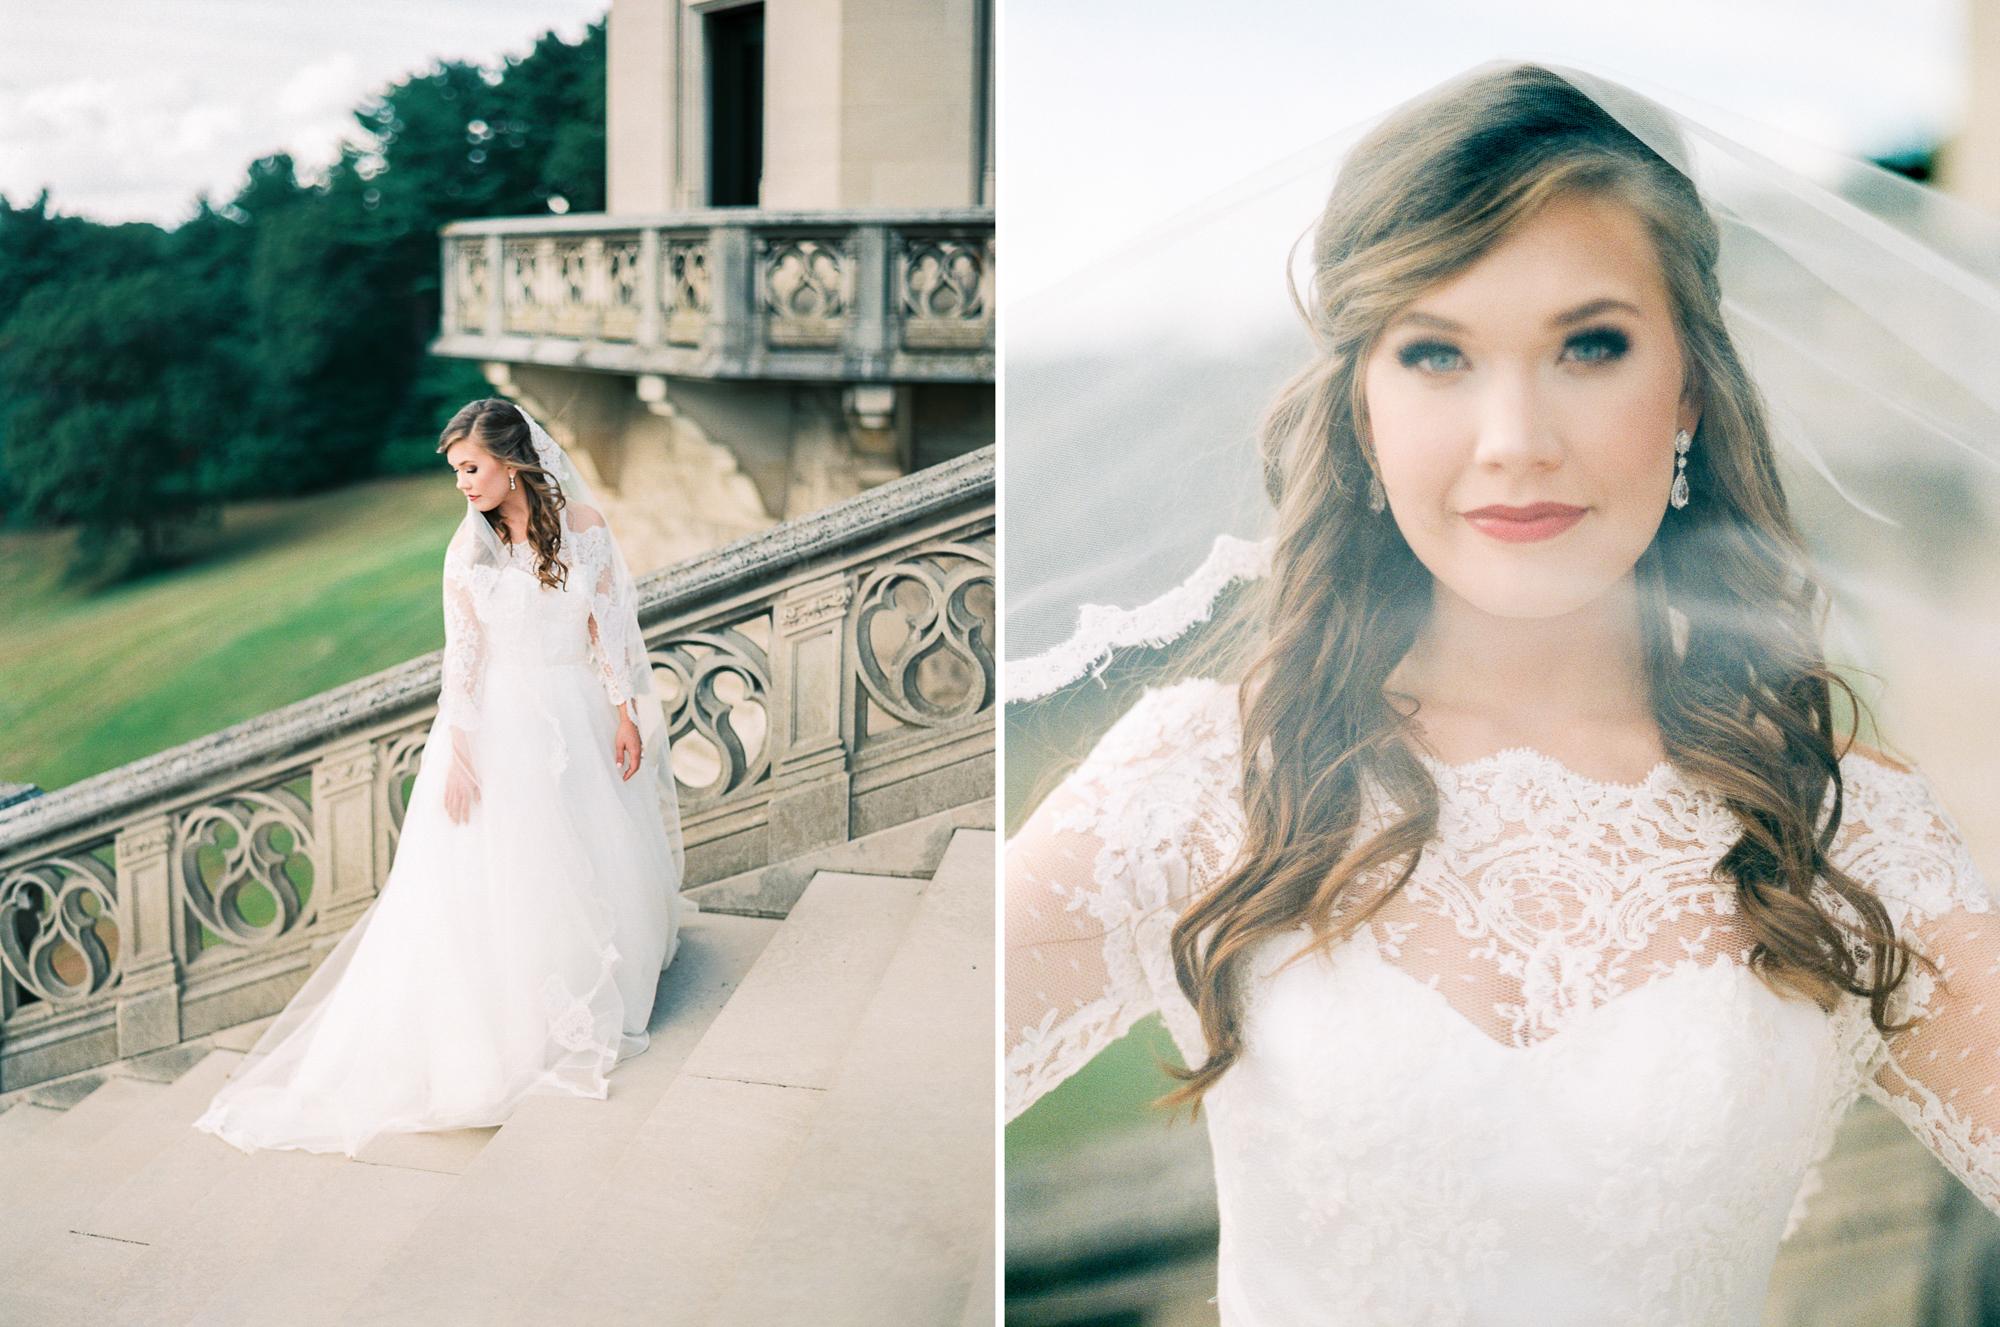 timeless-classy-cathedral-veil-bridal-session-biltmore-north-carolina-wedding-film-photographer-15.jpg